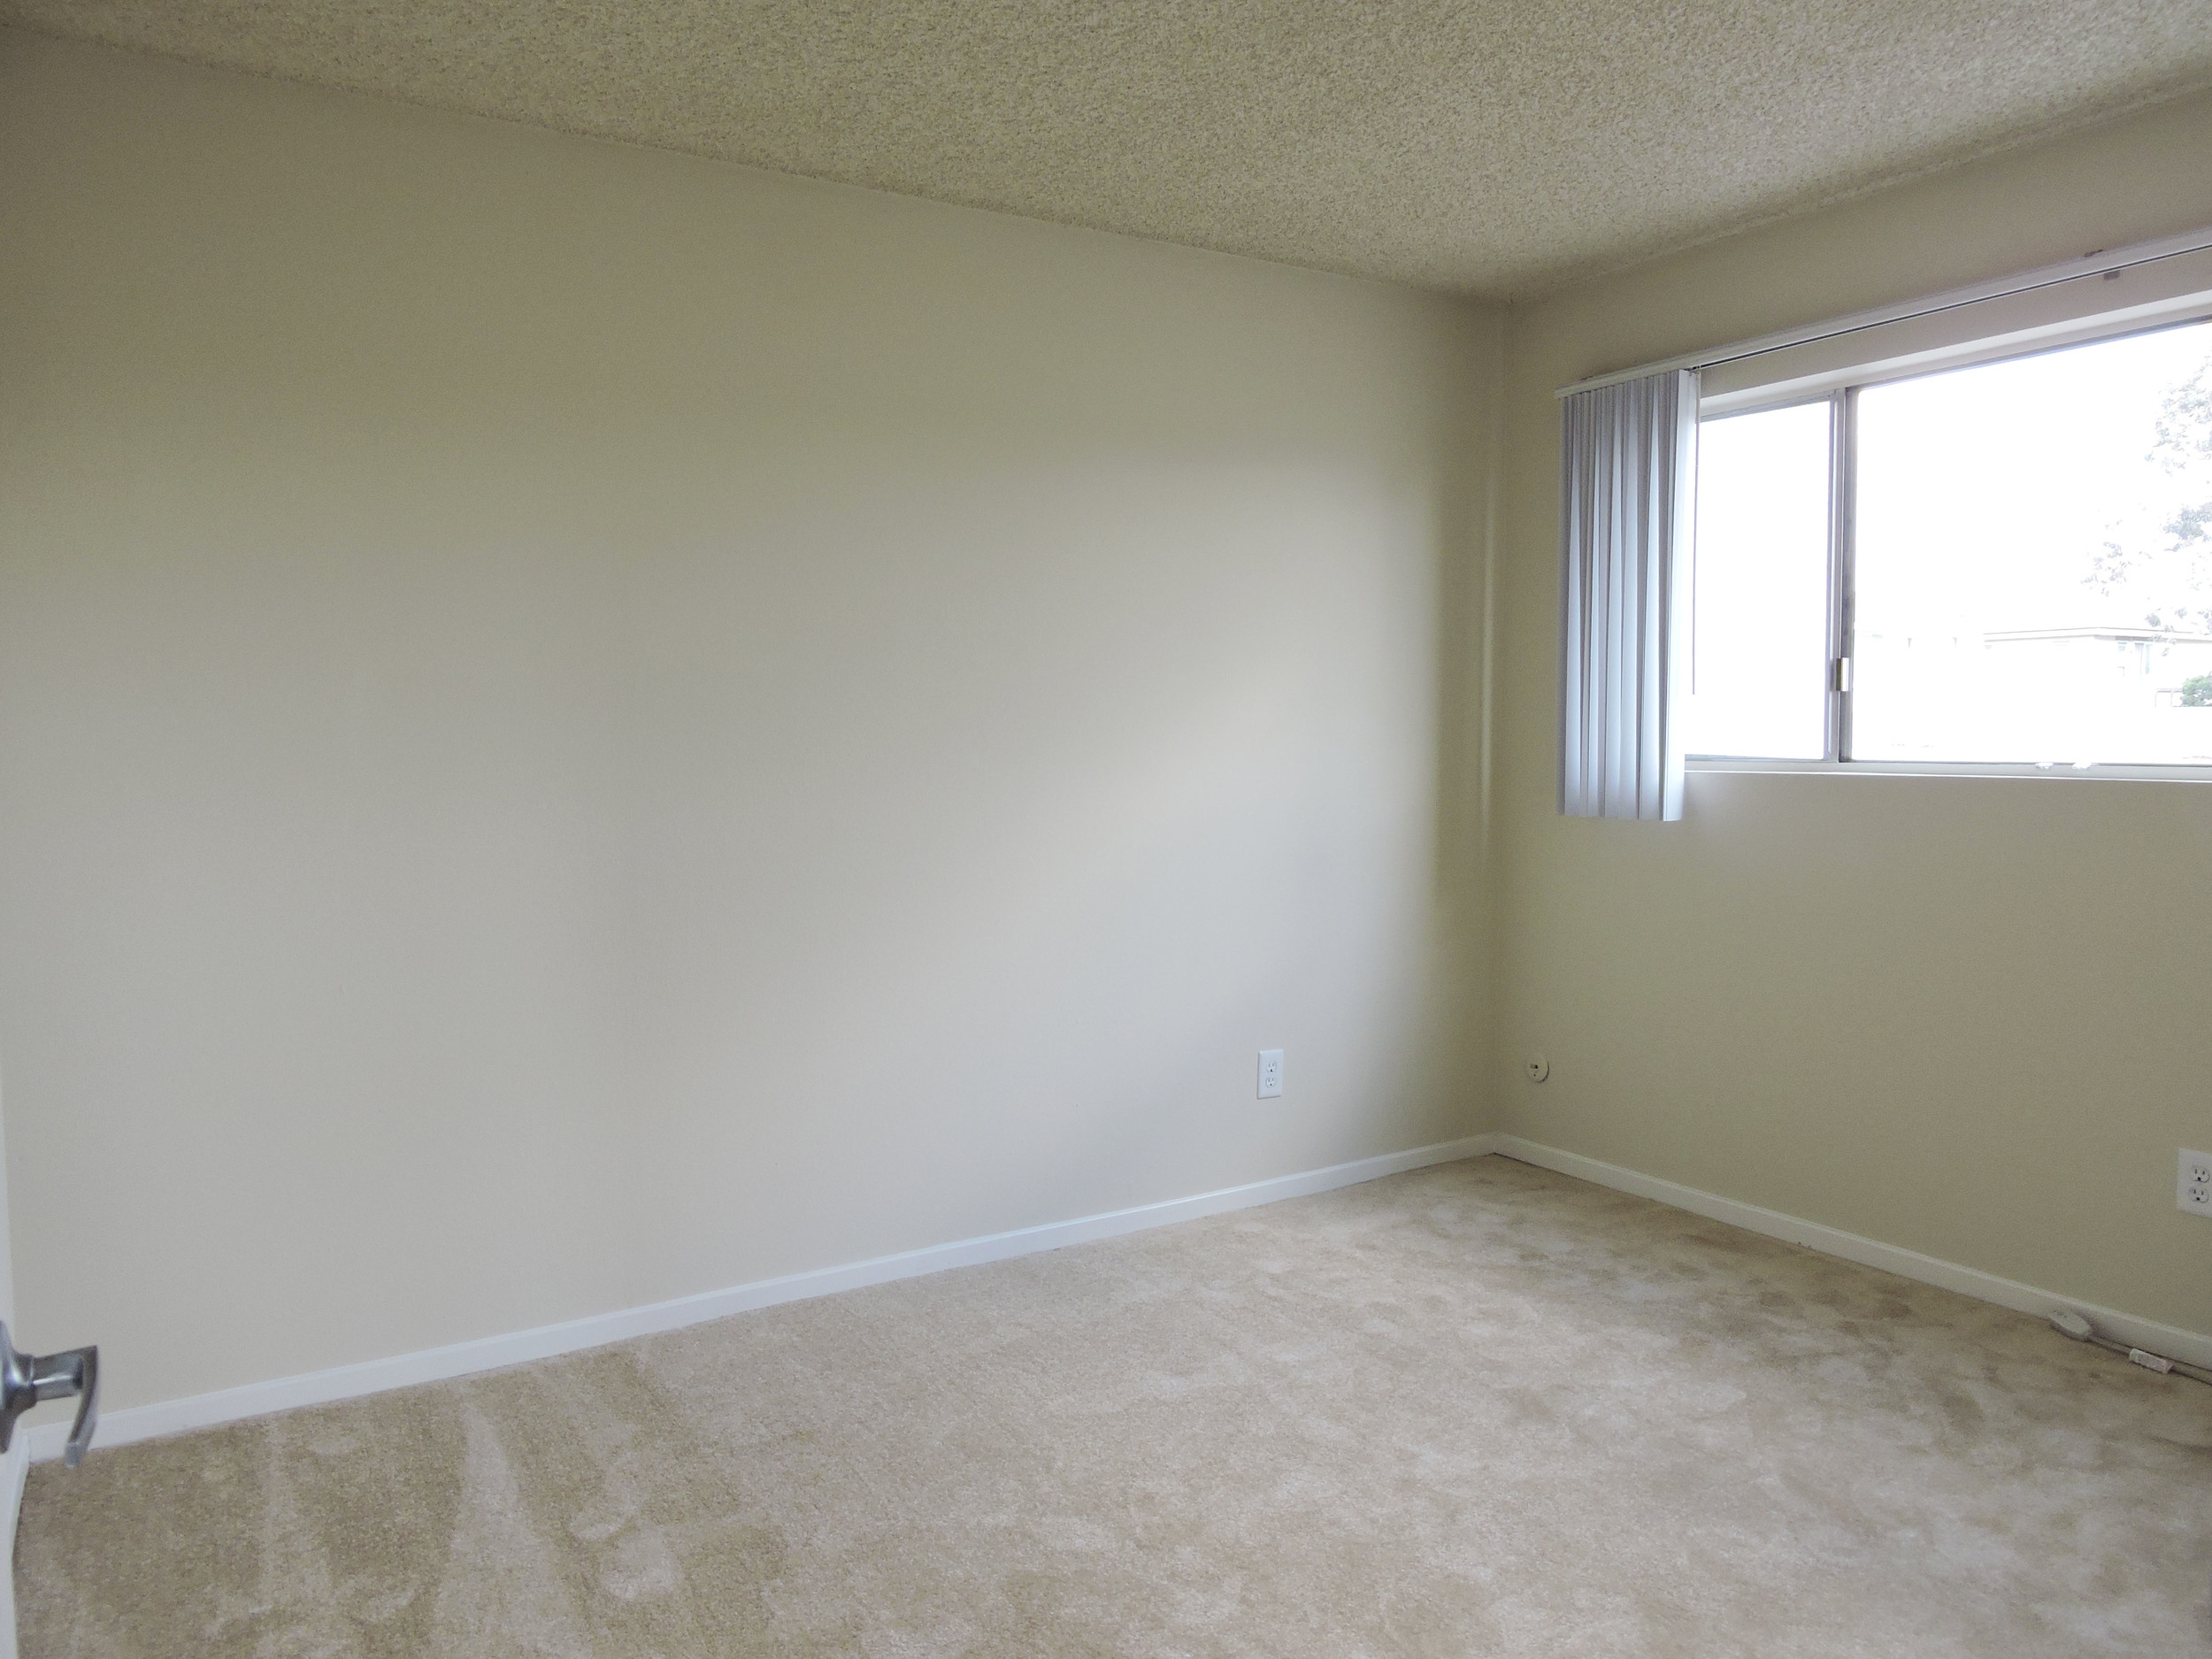 233 bedroom3.jpg